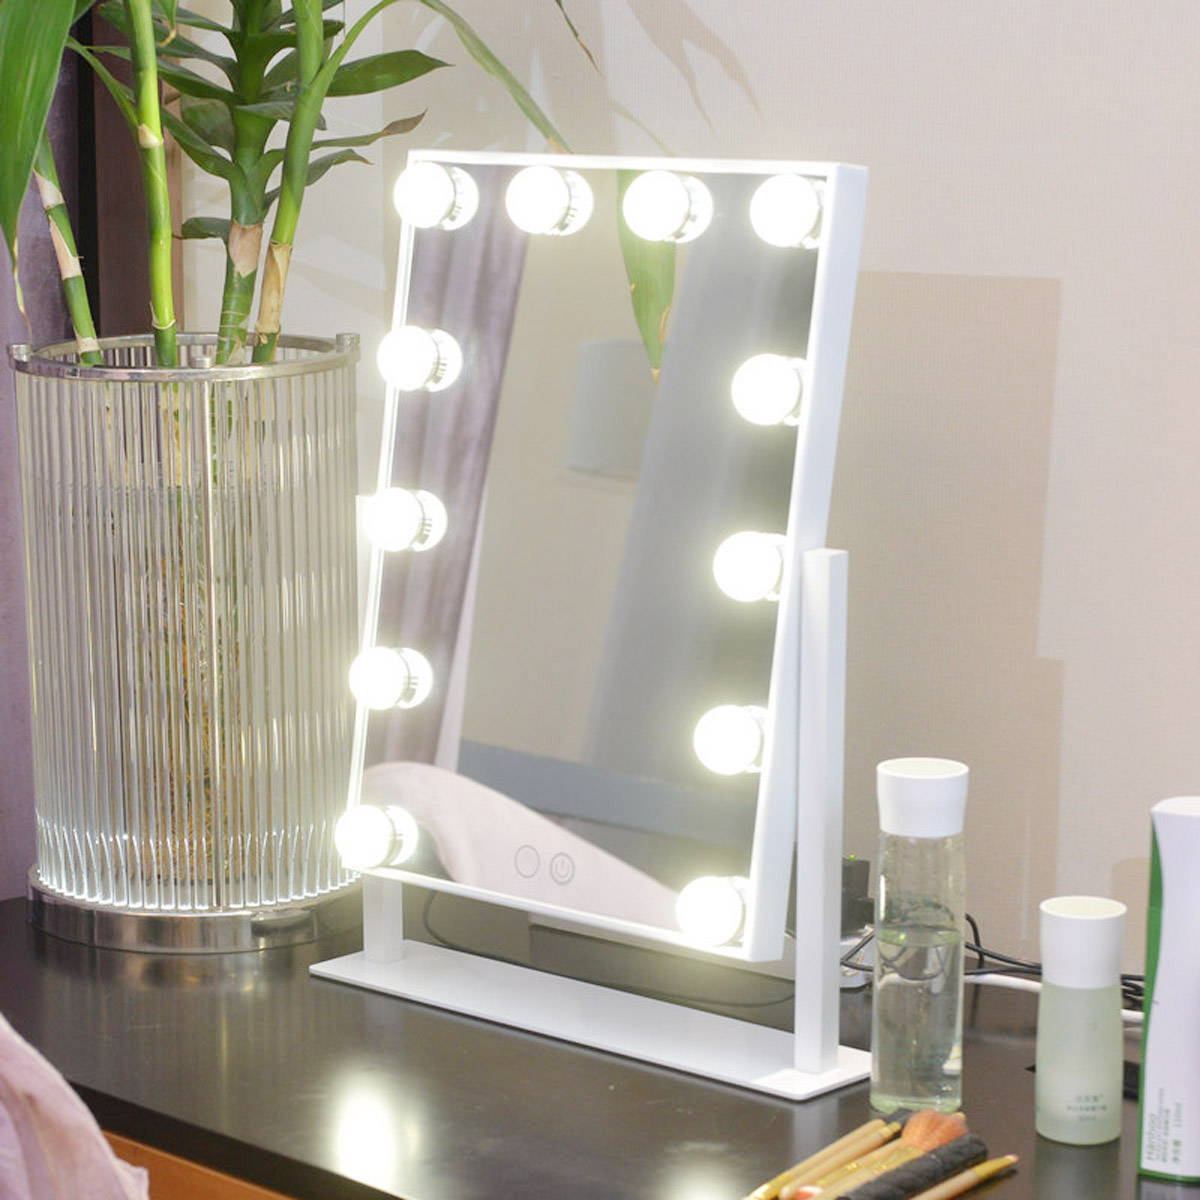 Professional Adjustable 12 LED Lighted Makeup Mirror Portable Touch Screen Desktop Vanity Metal Frame Cosmetic Mirrors 22 led touch screen makeup mirror 10x magnifier bright lighted cosmetic makeup mirror portable vanity countertop 180 rotating